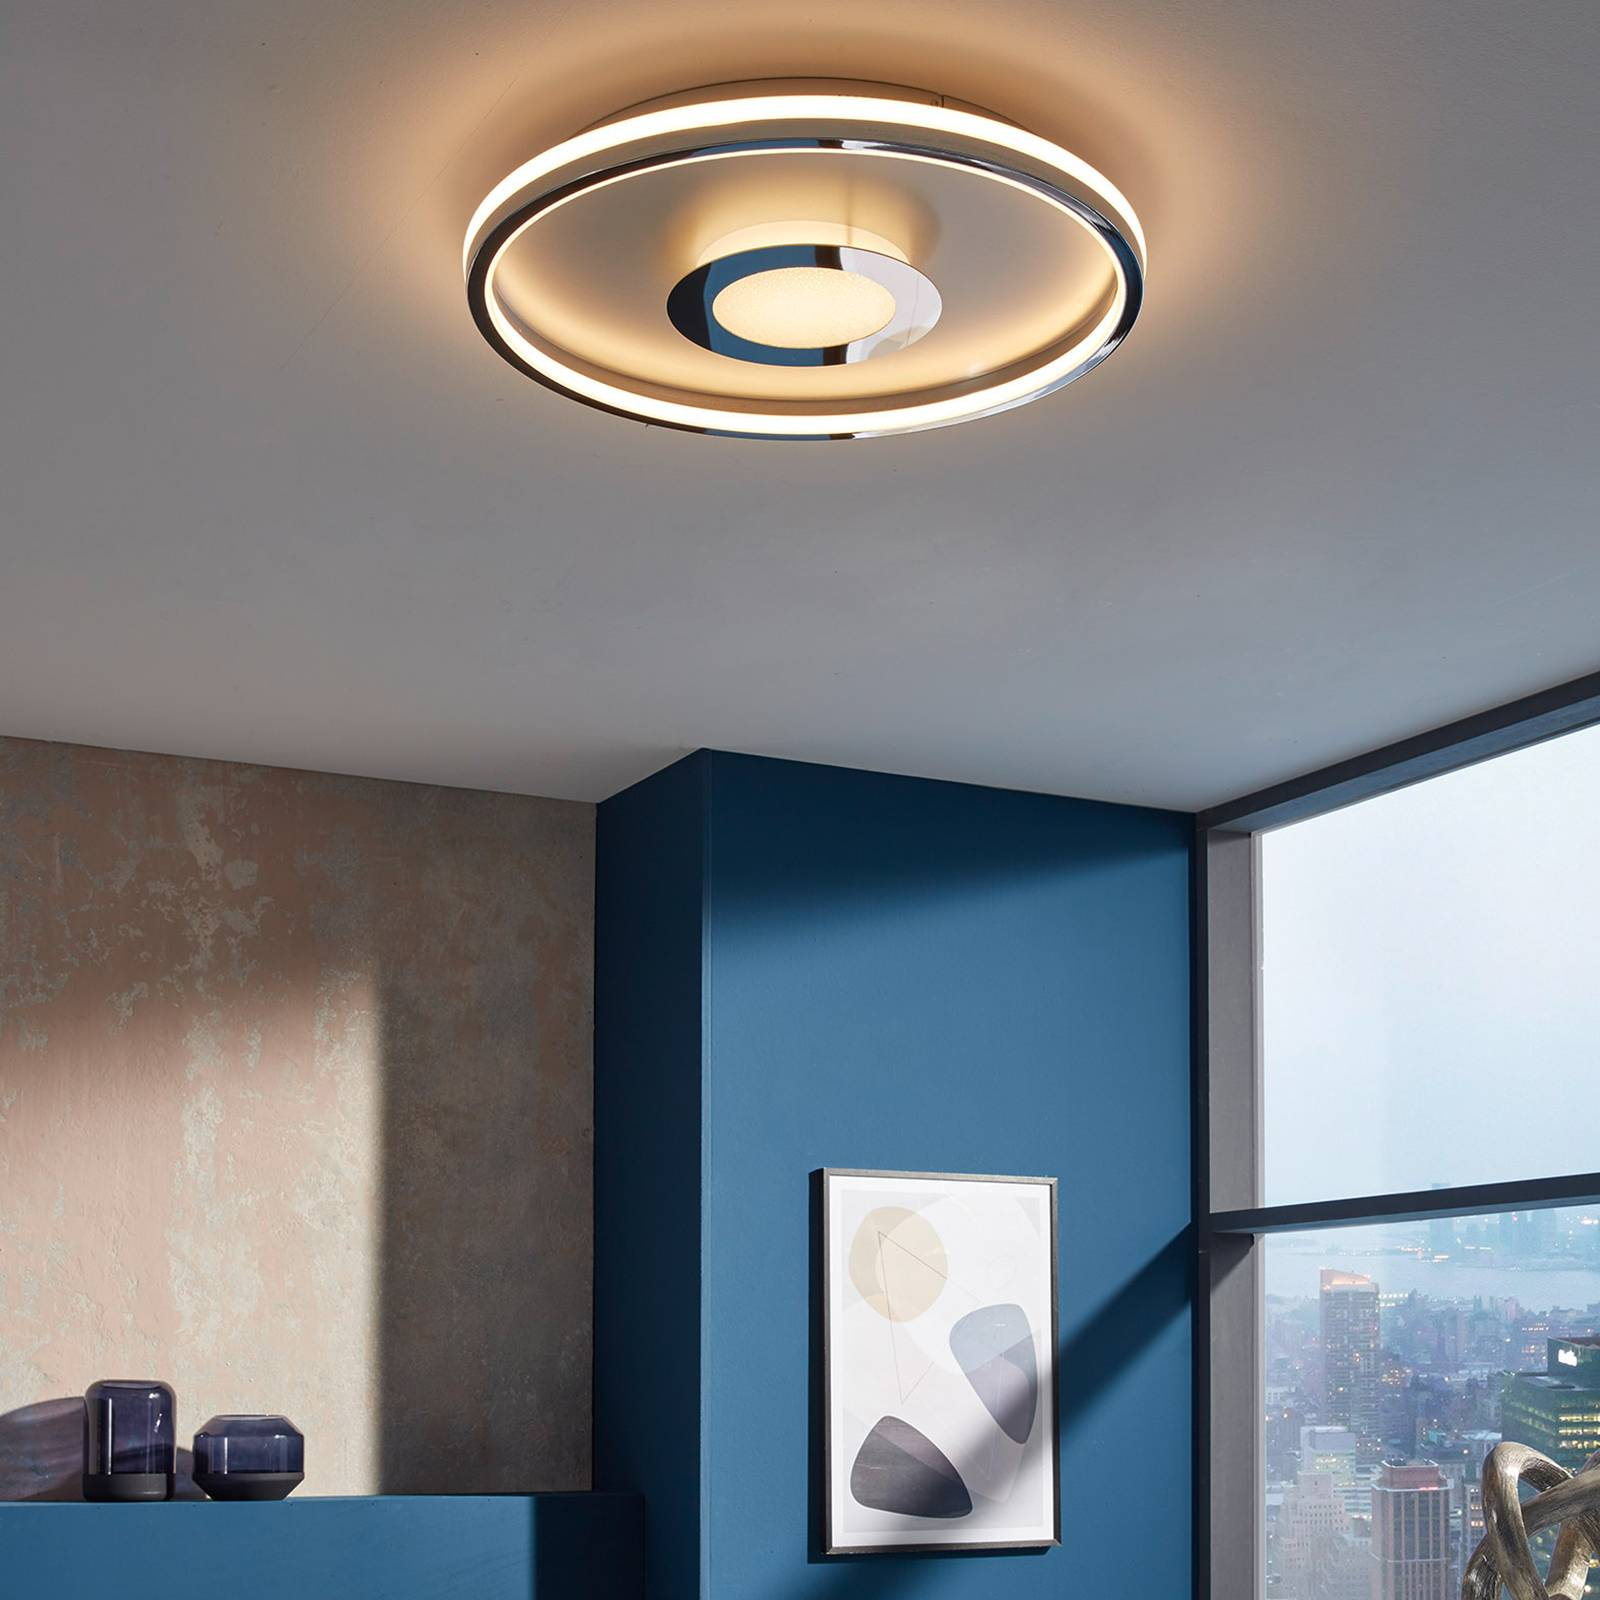 LED-kattovalaisin Bug pyöreä, kromi, 60 cm